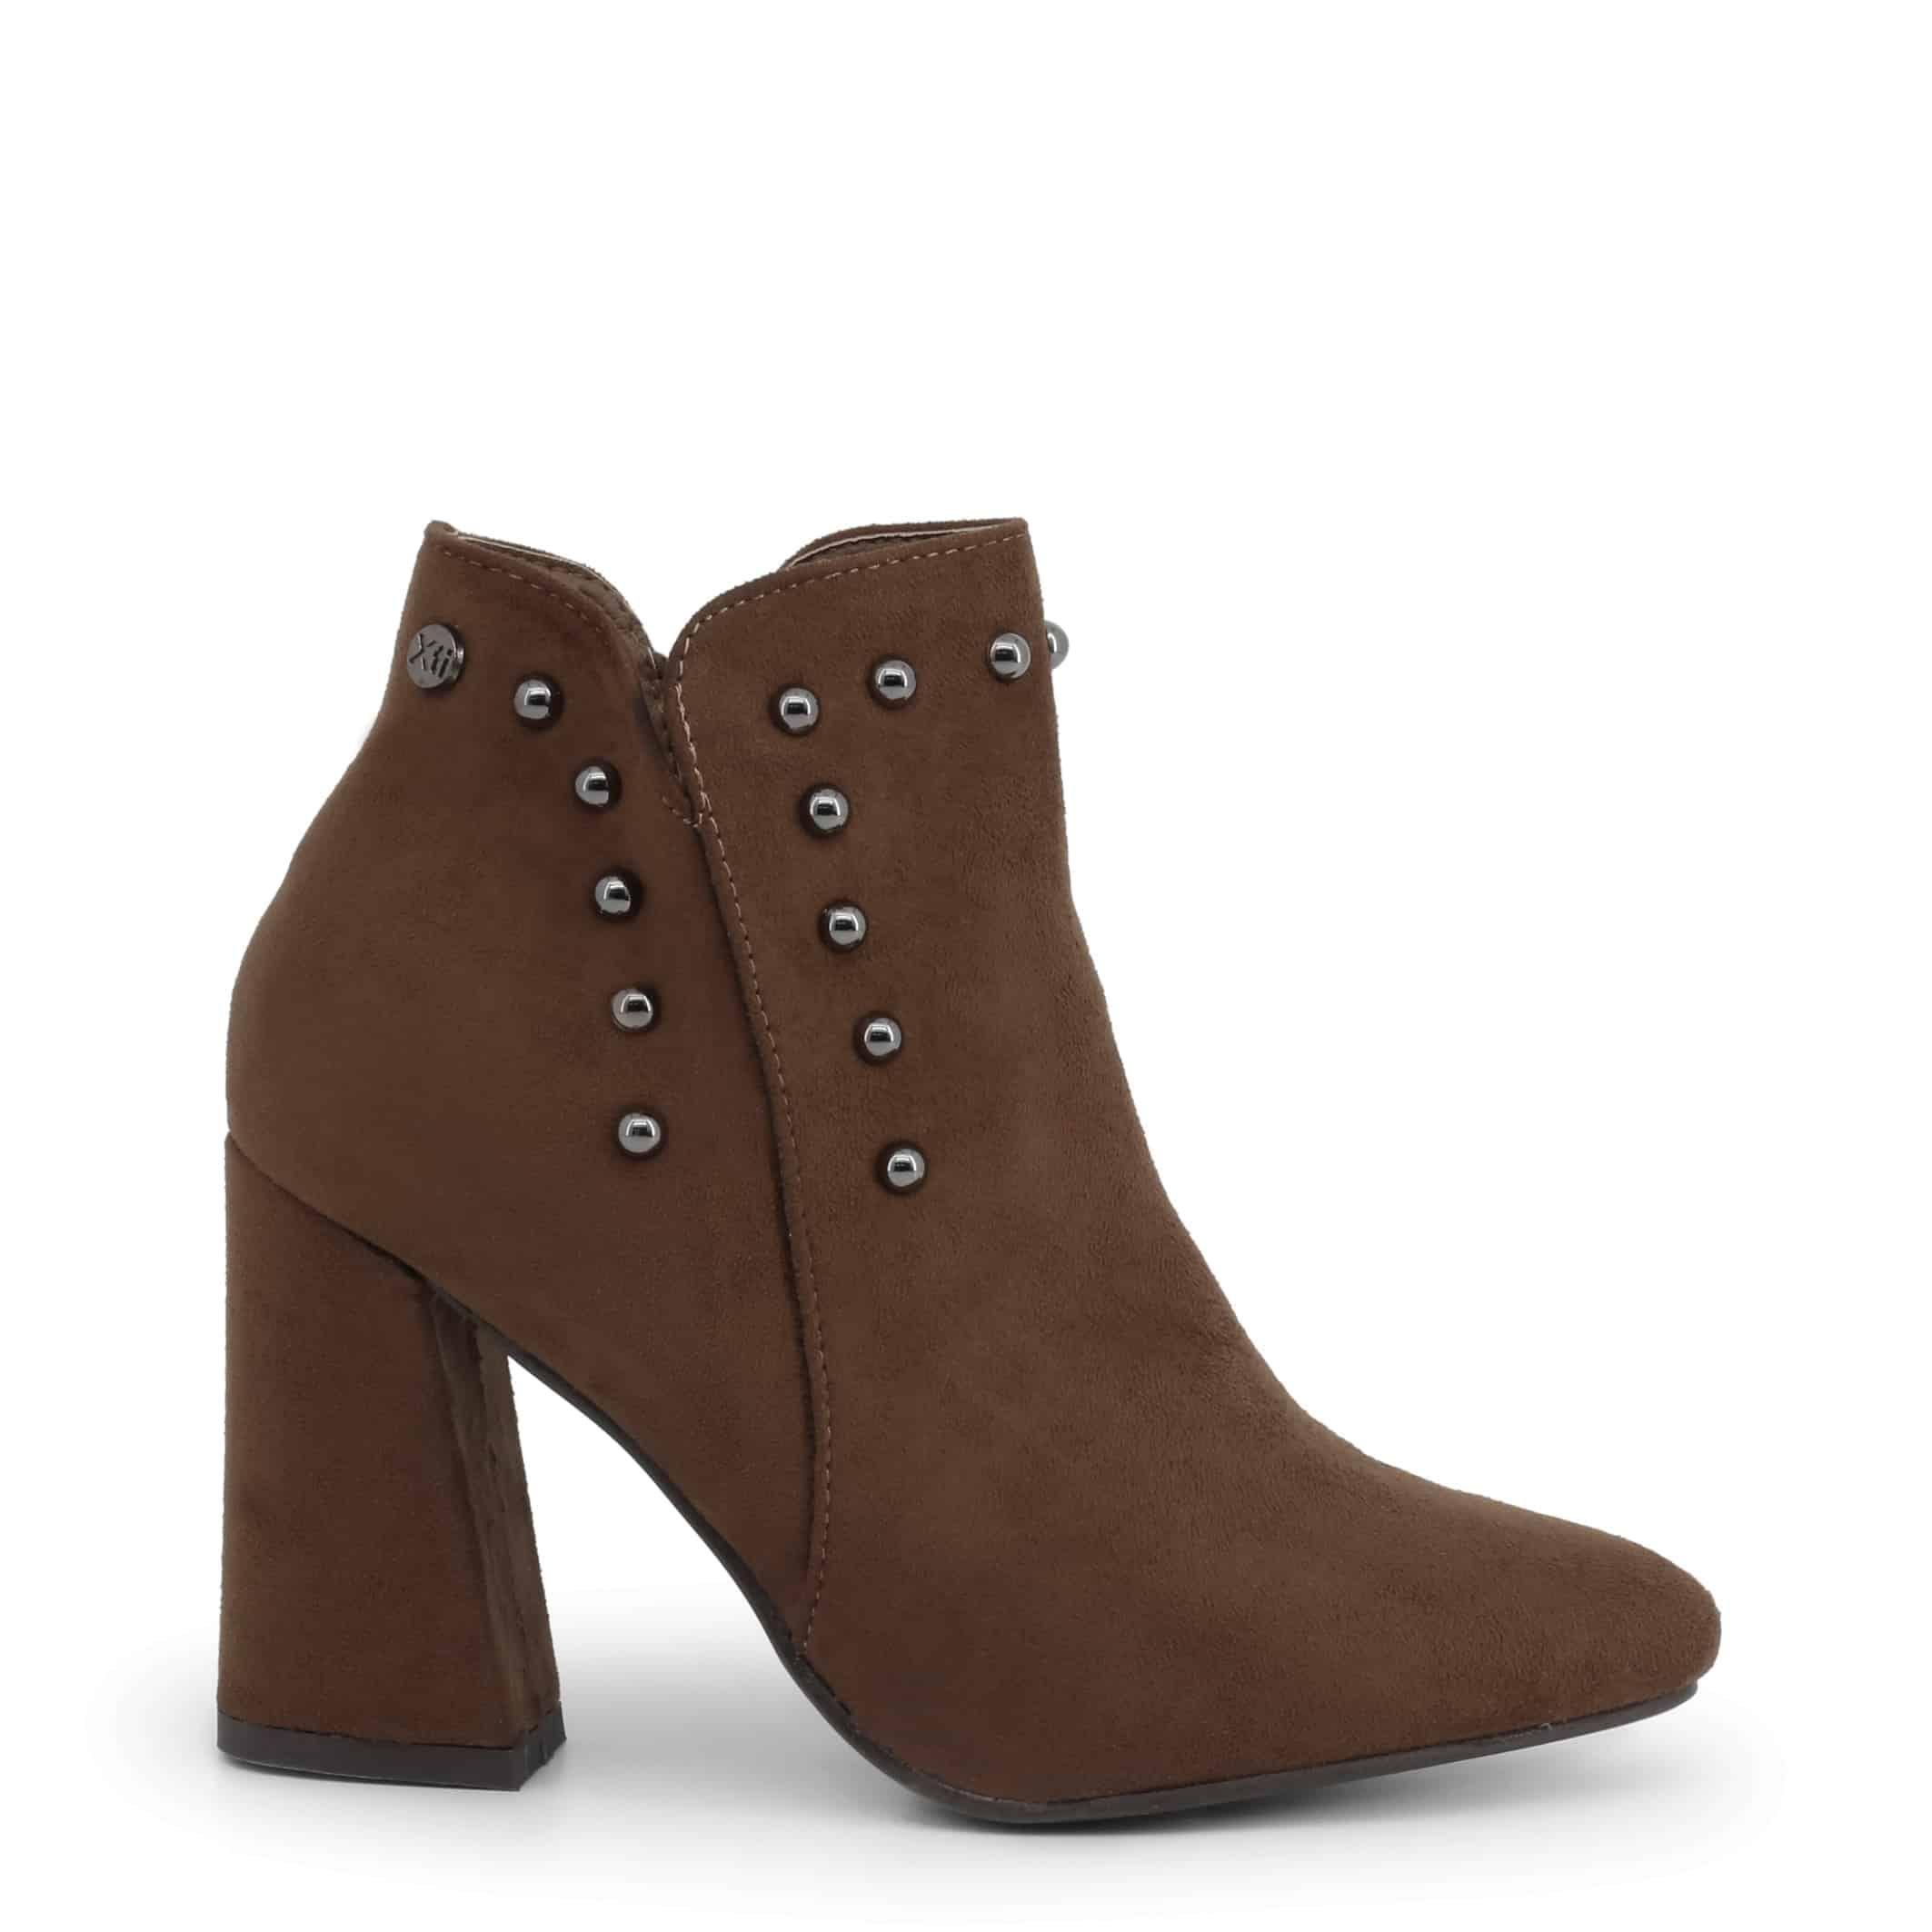 Schuhe U.S. Polo Assn. – JARED4052S9_Y1 – Schwarz